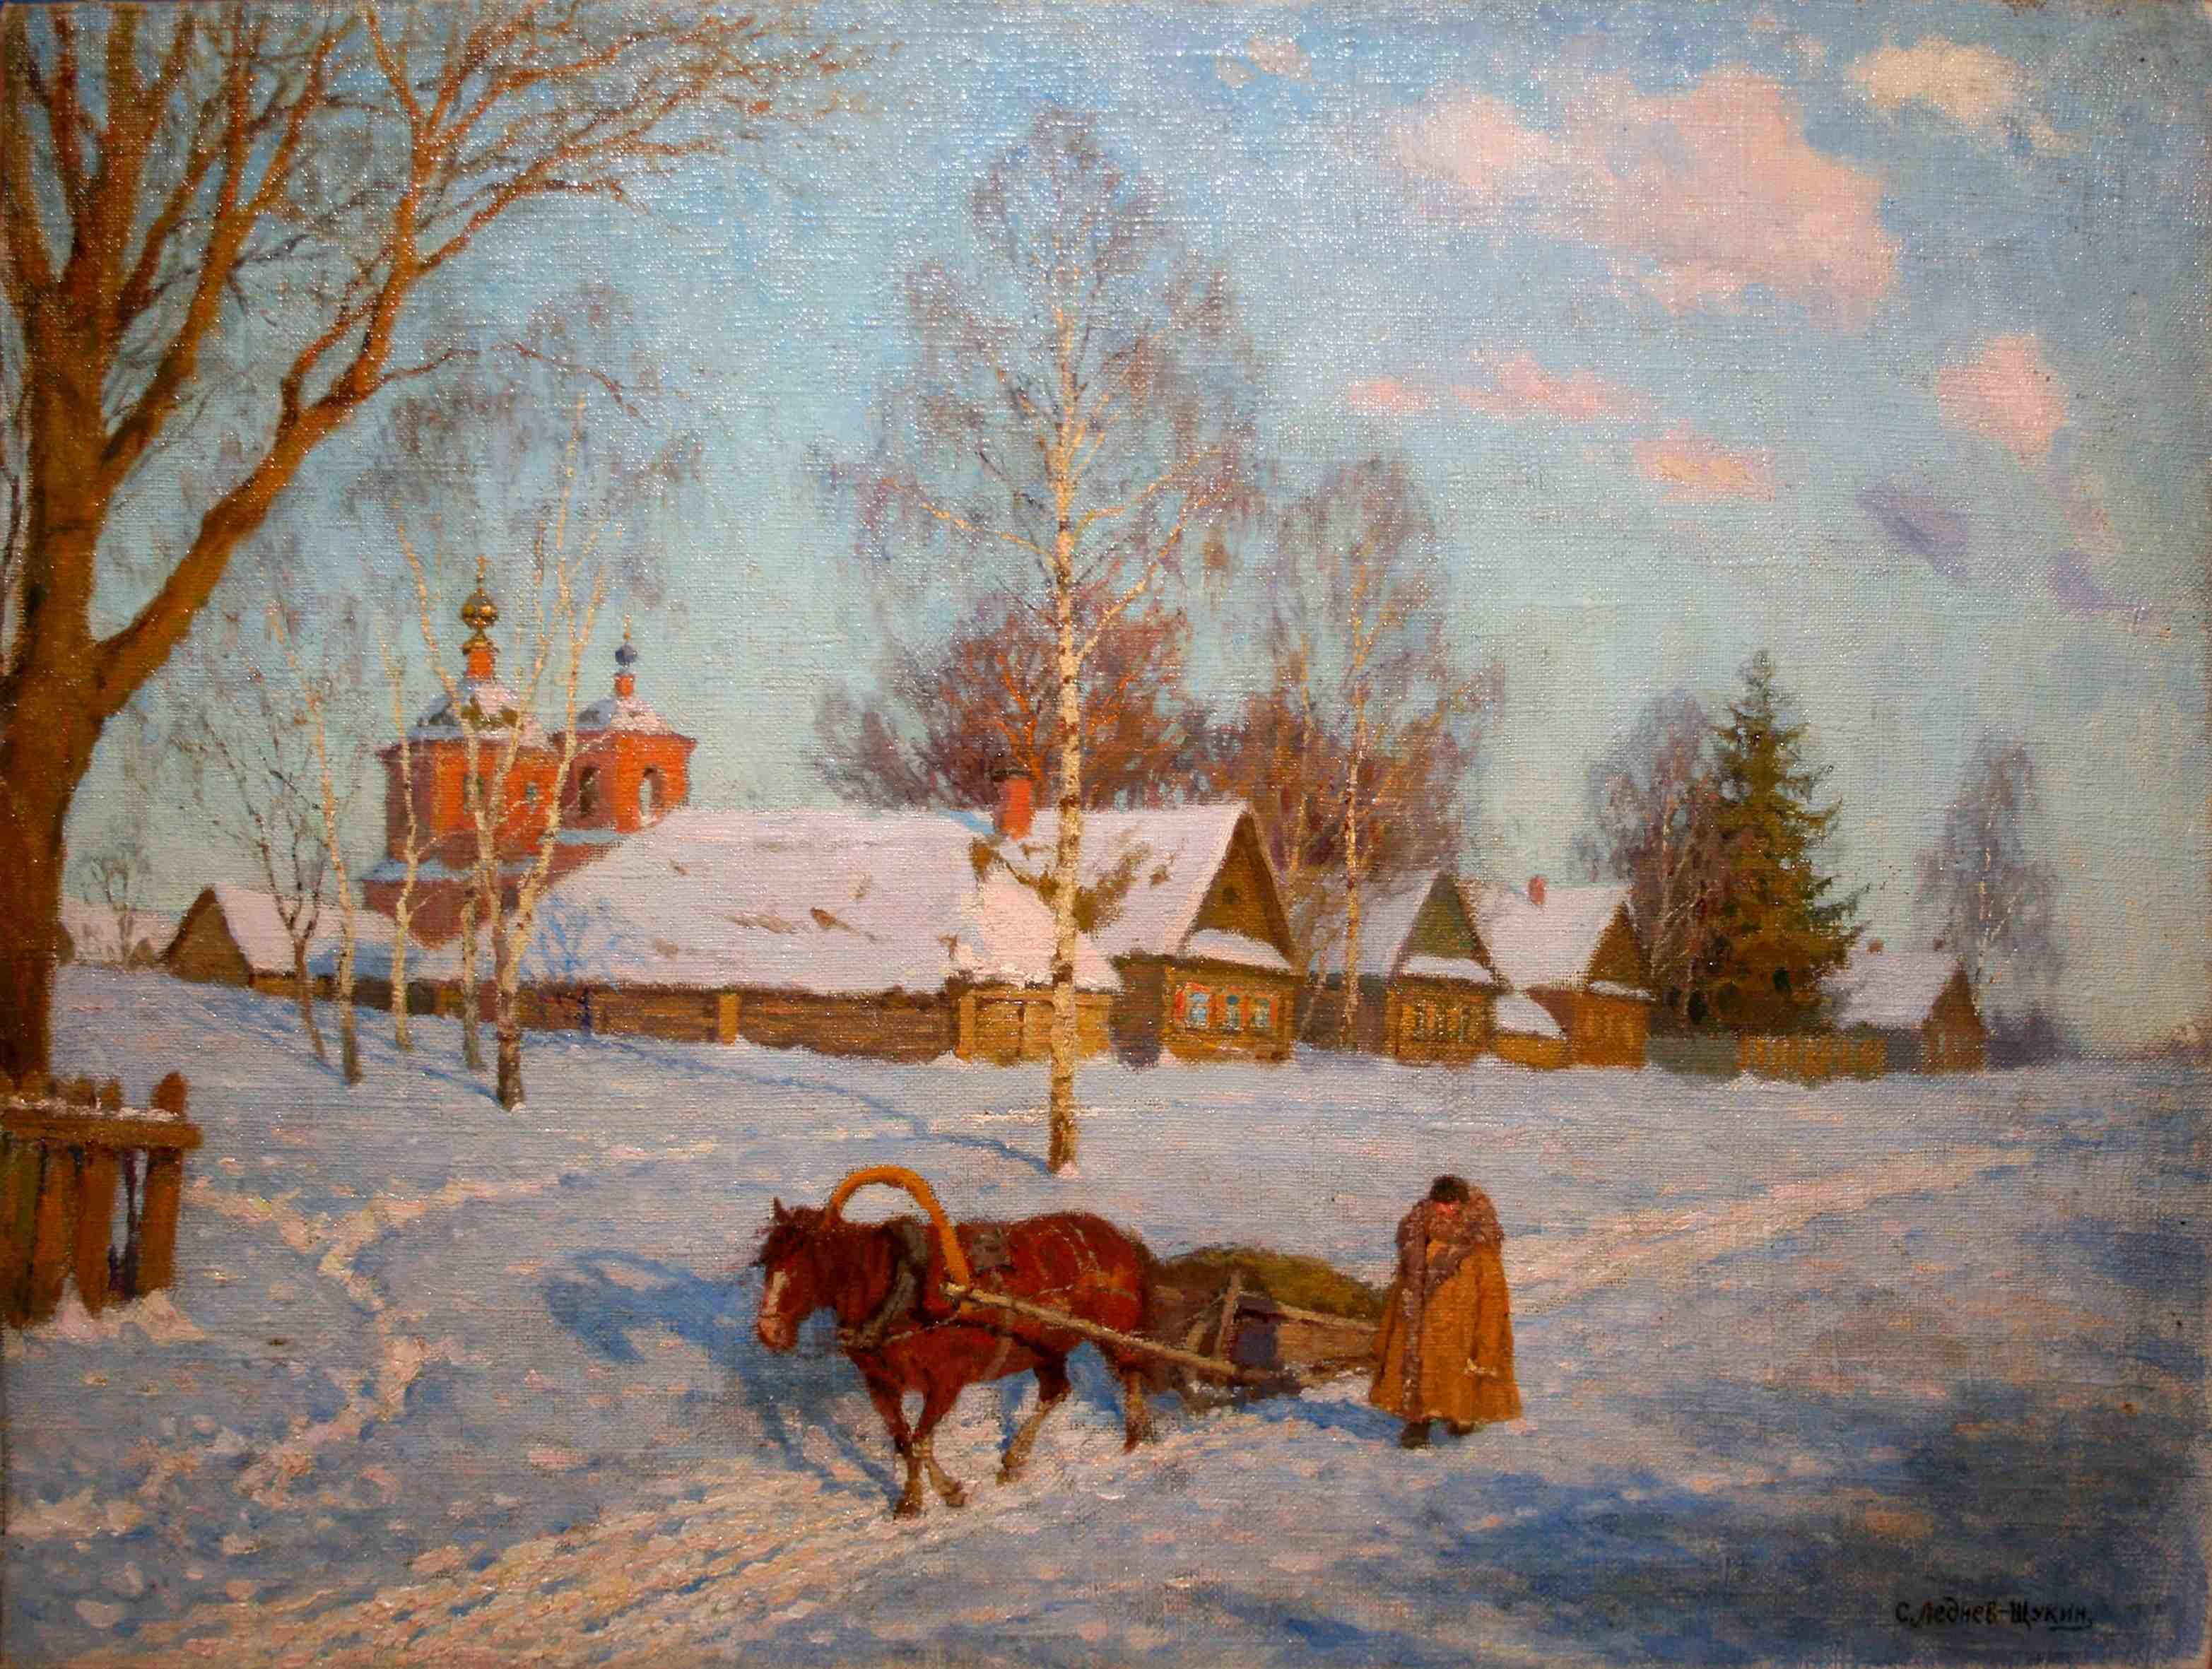 Леднев-Щукин Сергей Евграфович. Март в деревне.